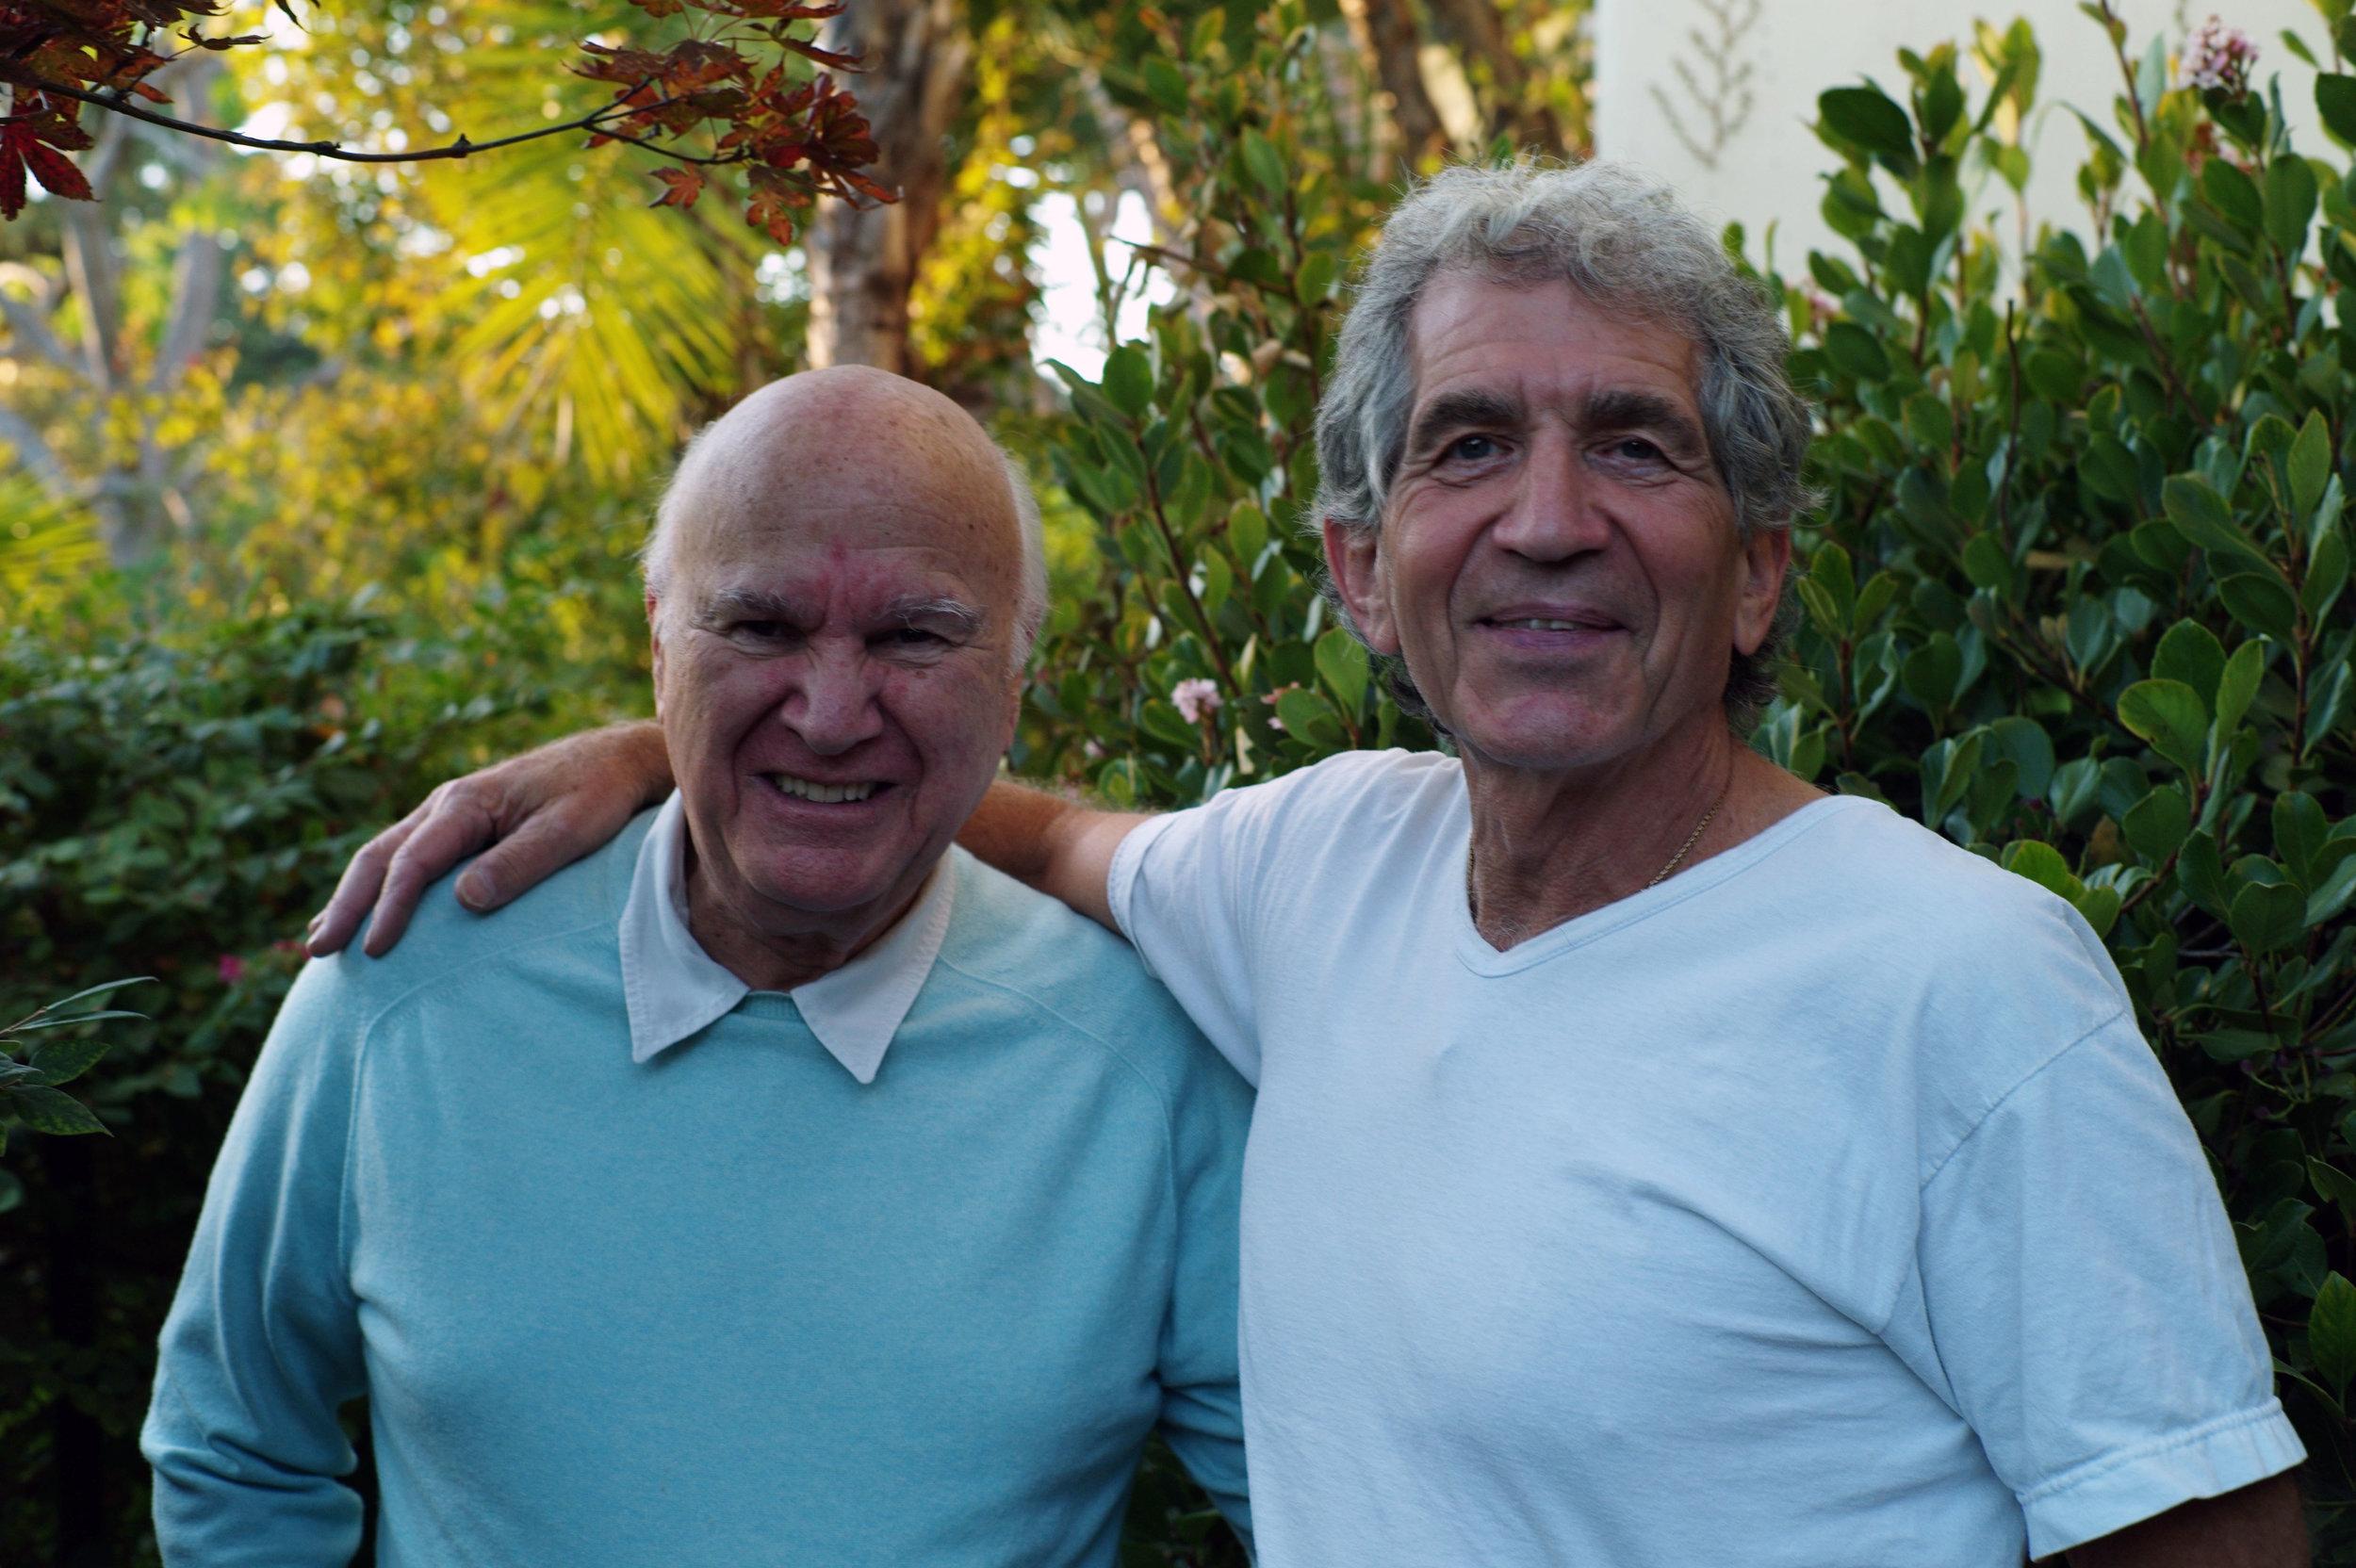 Paul L. and Gene